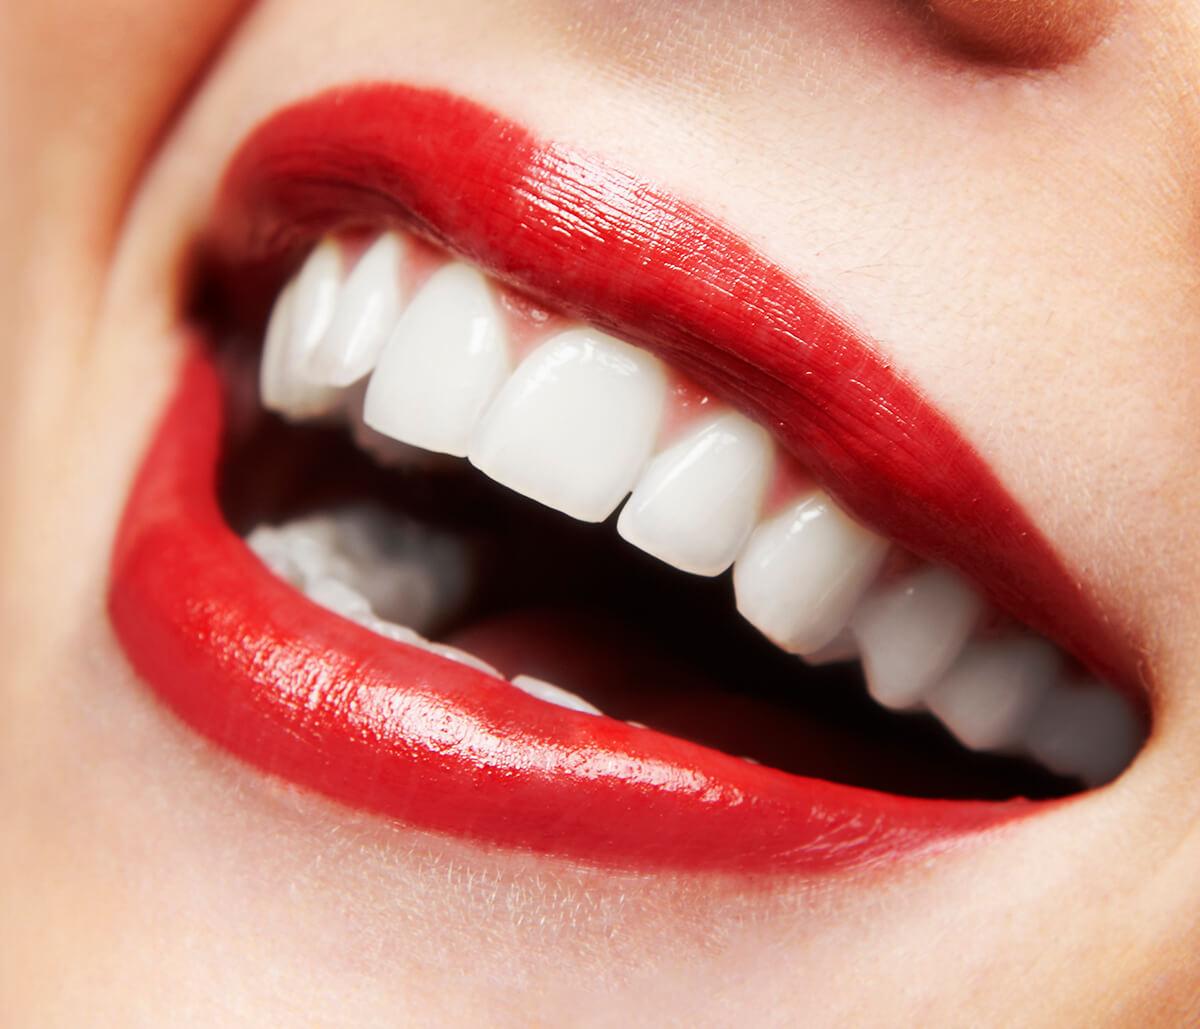 Teeth Whitening Tips in San Francisco Area